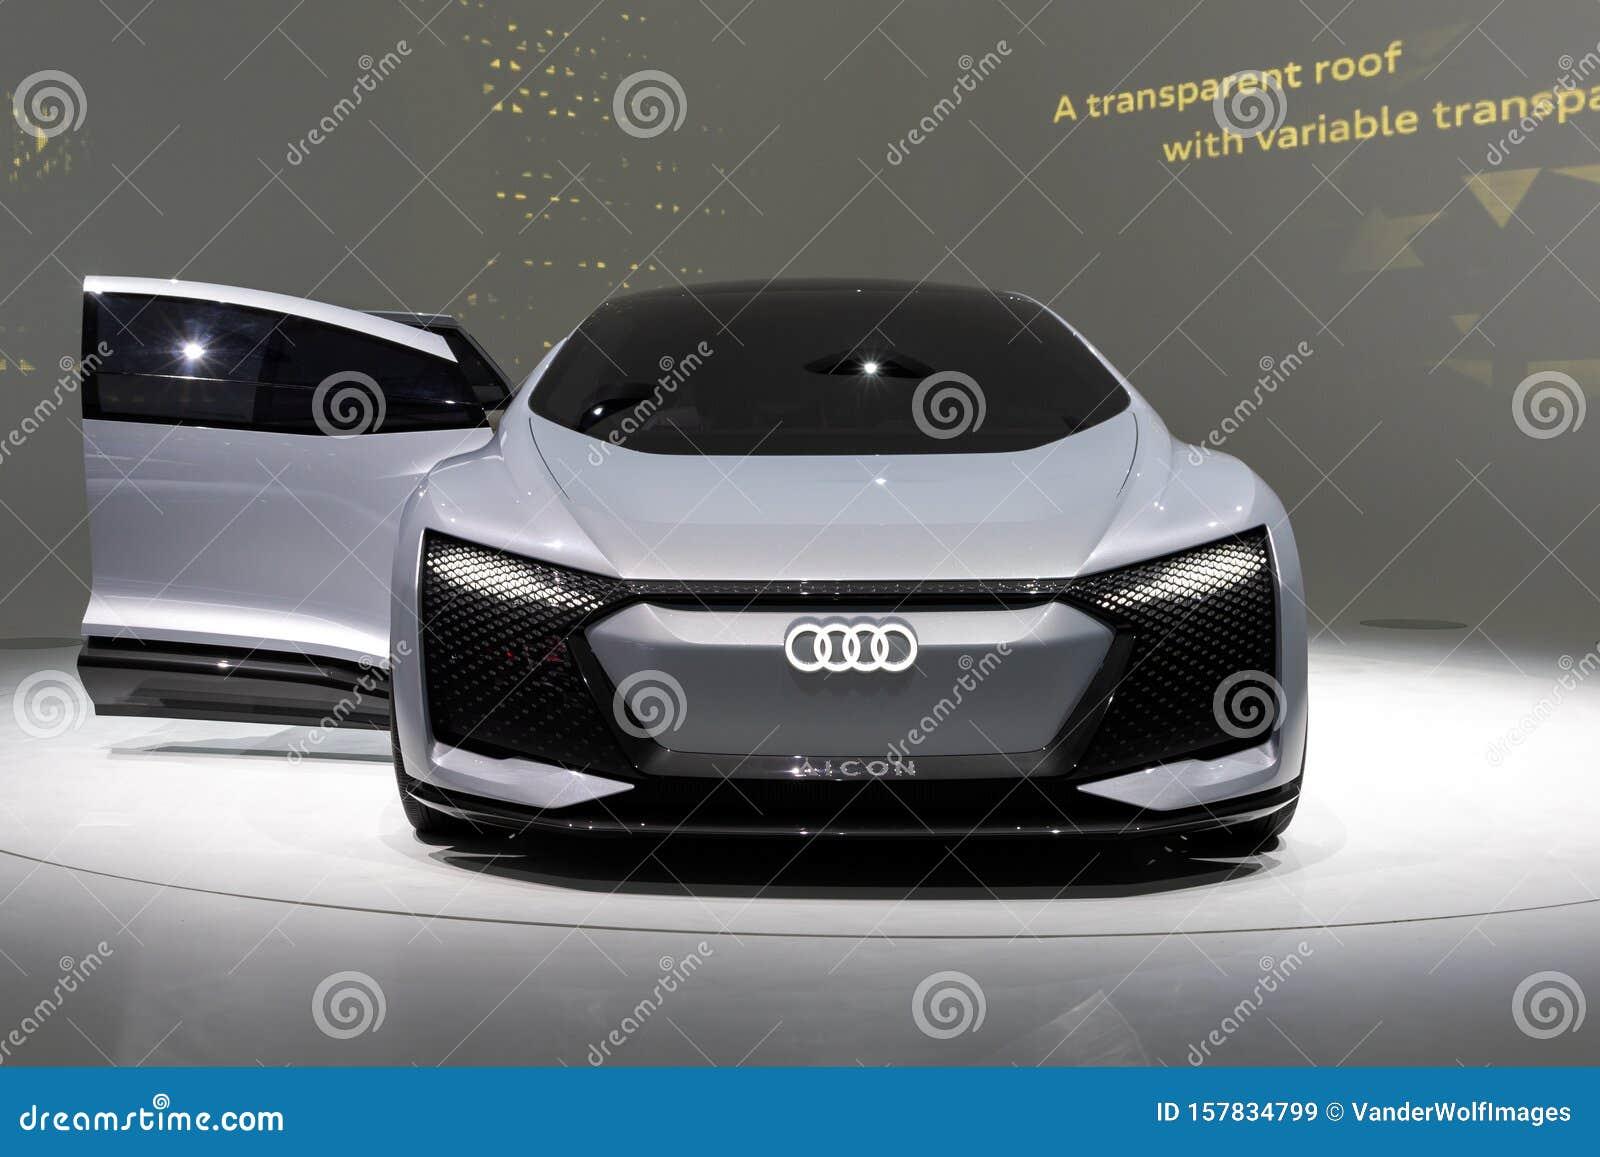 Audi Aicon Autonomous Electric Car Editorial Stock Image Image Of Concept Cars 157834799